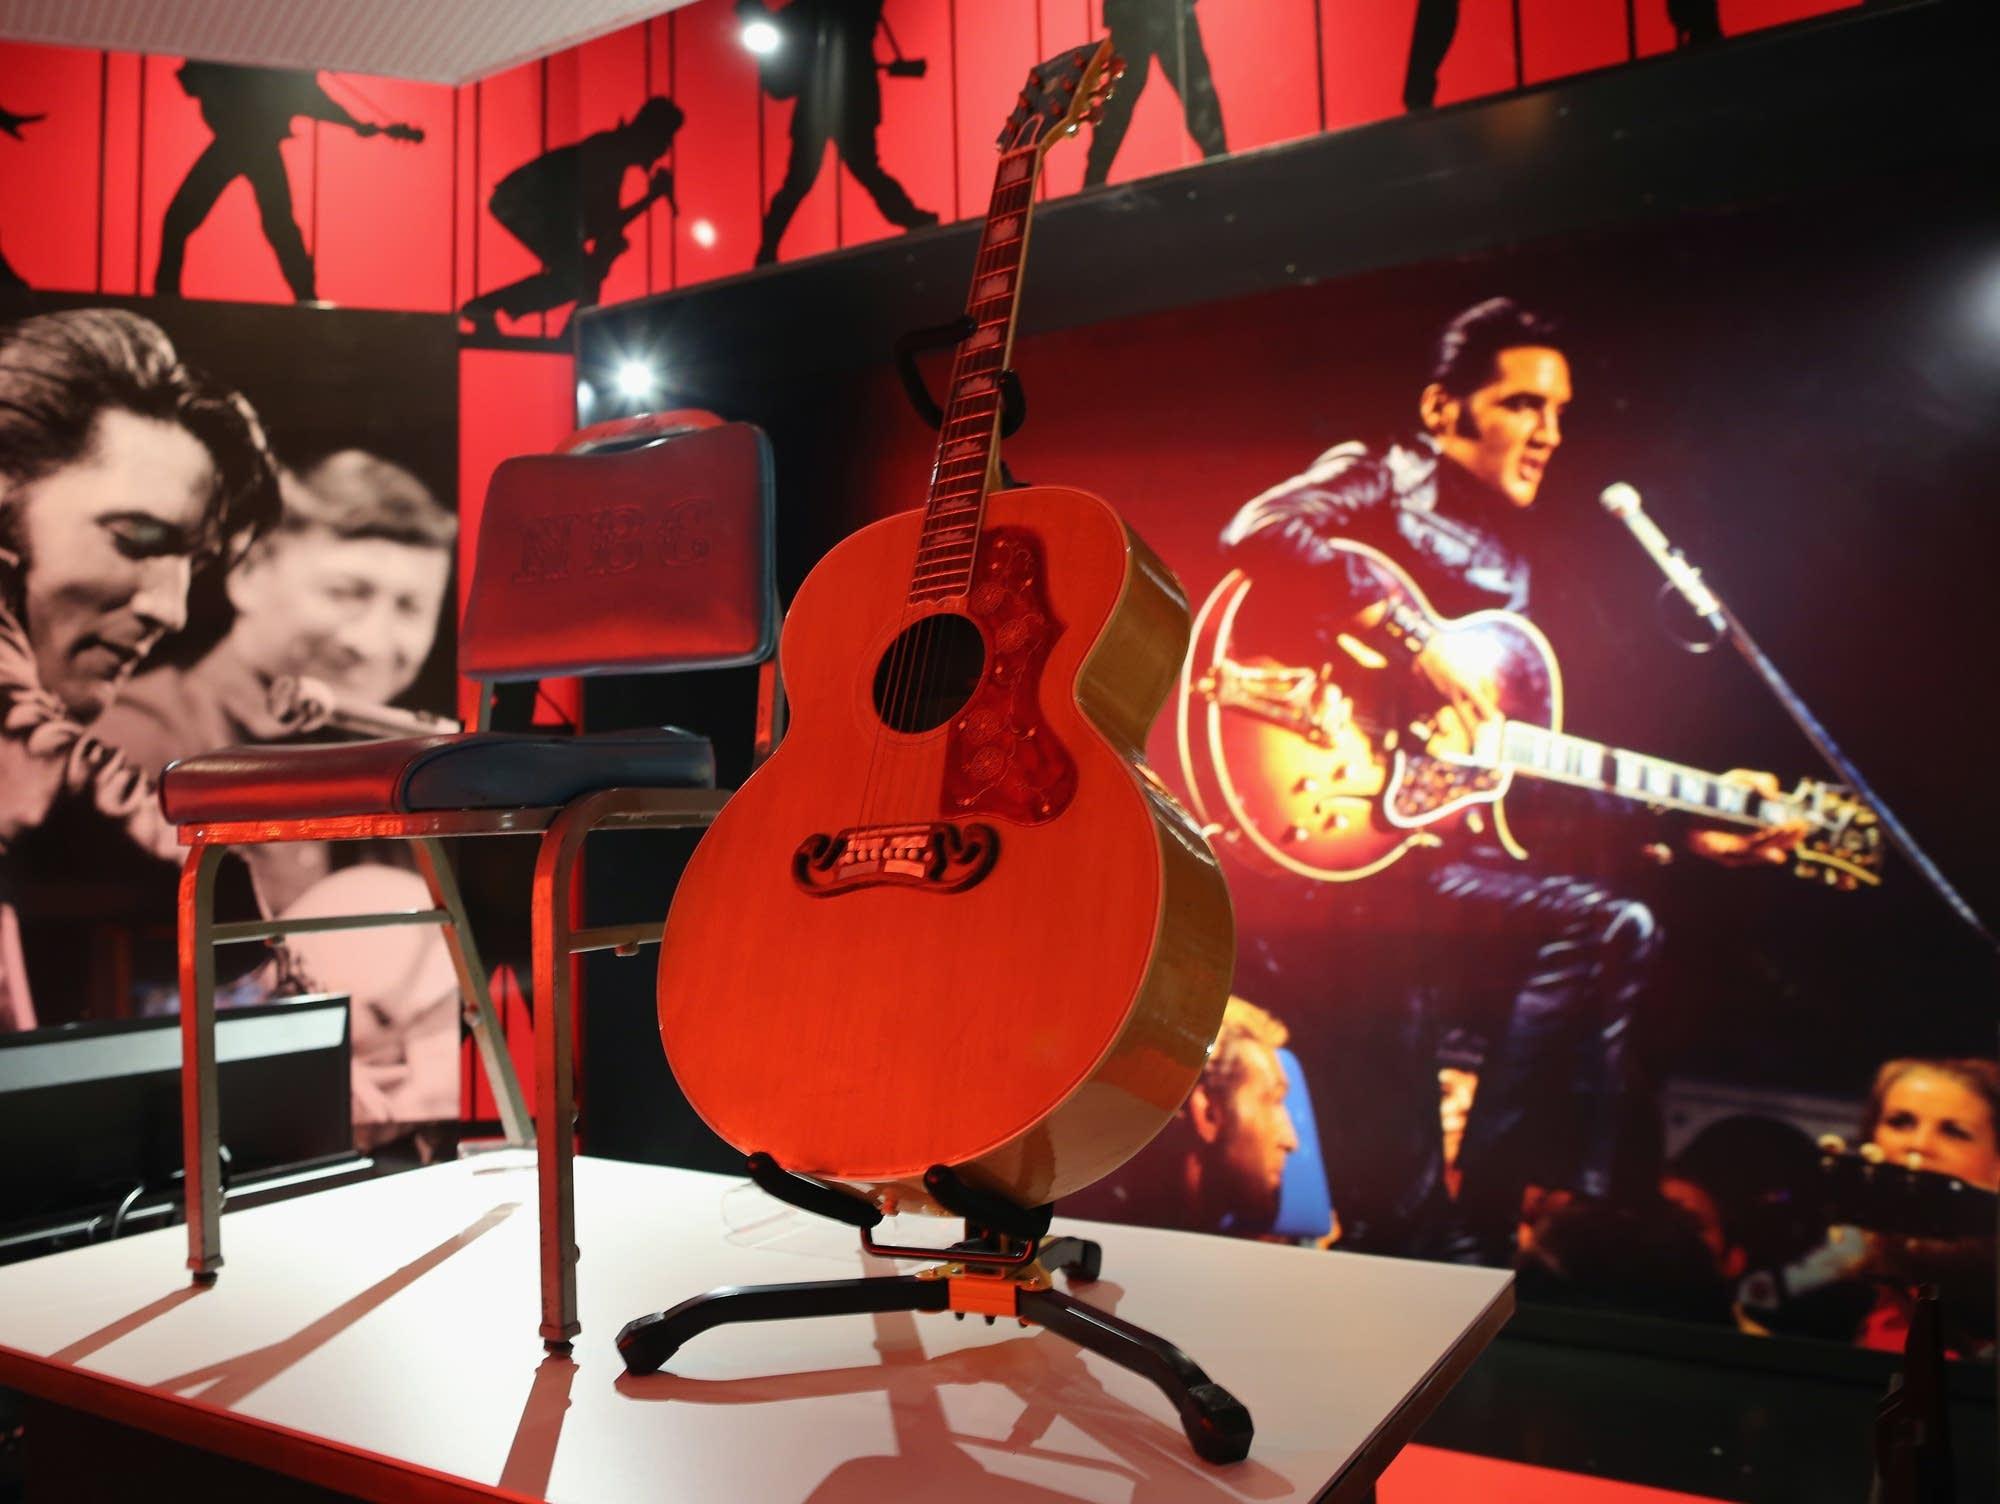 A guitar played by Elvis Presley in 1968.